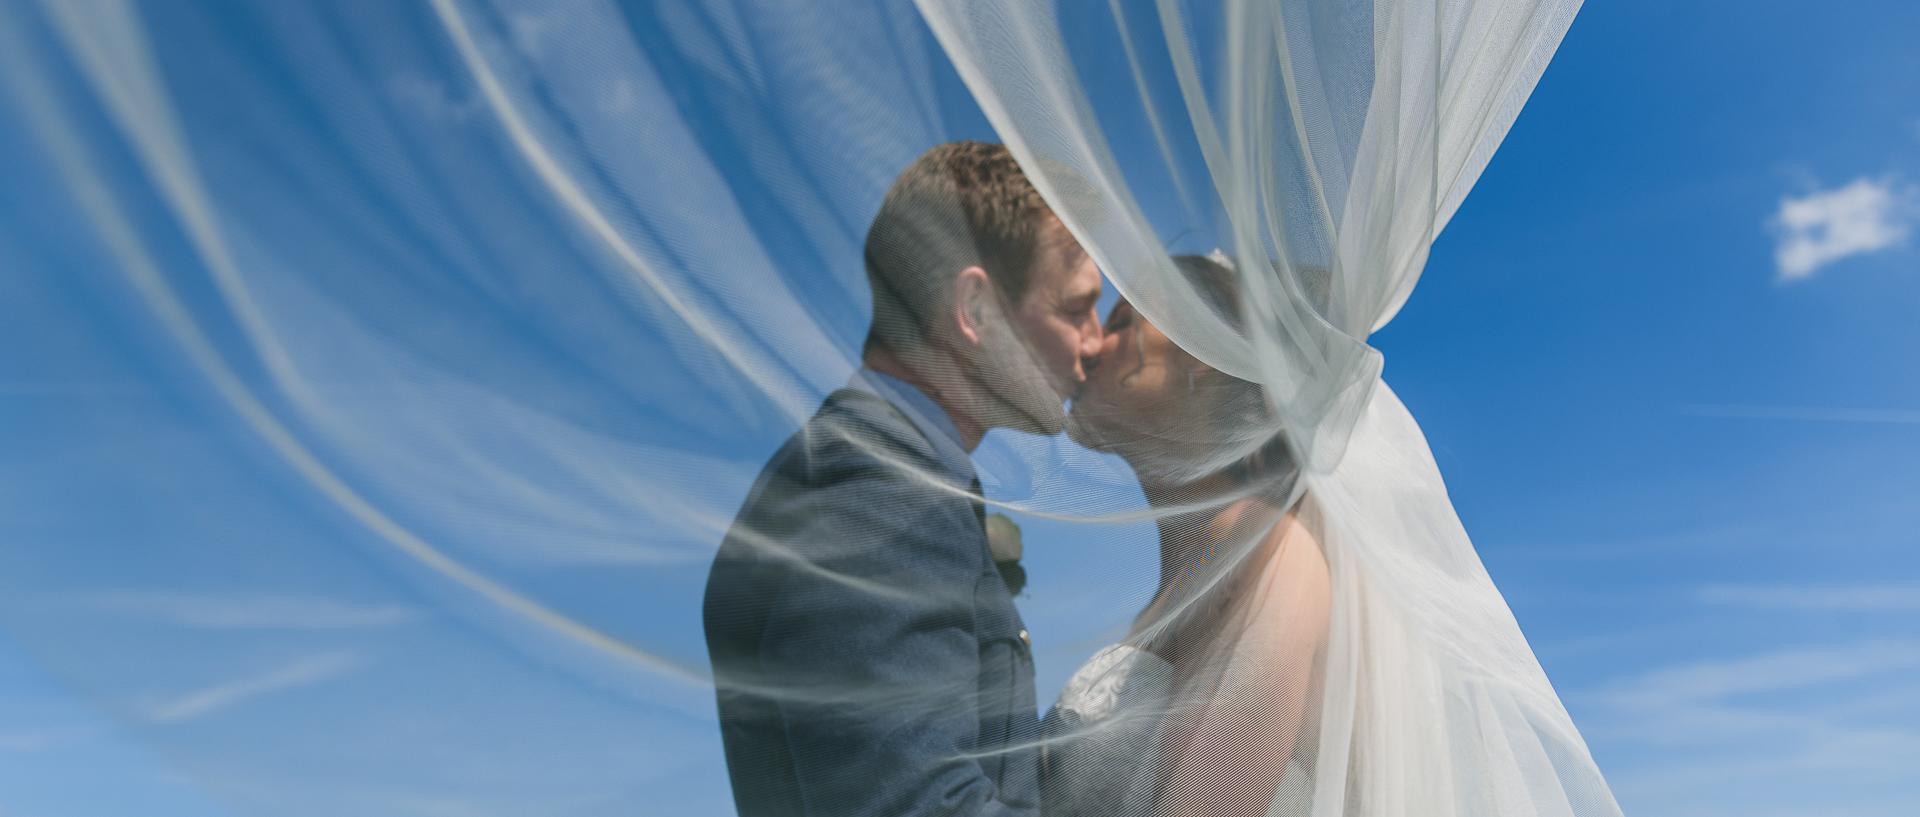 ABBIE AND CALLAM WEDDING AT ROCKLIFFE HALL